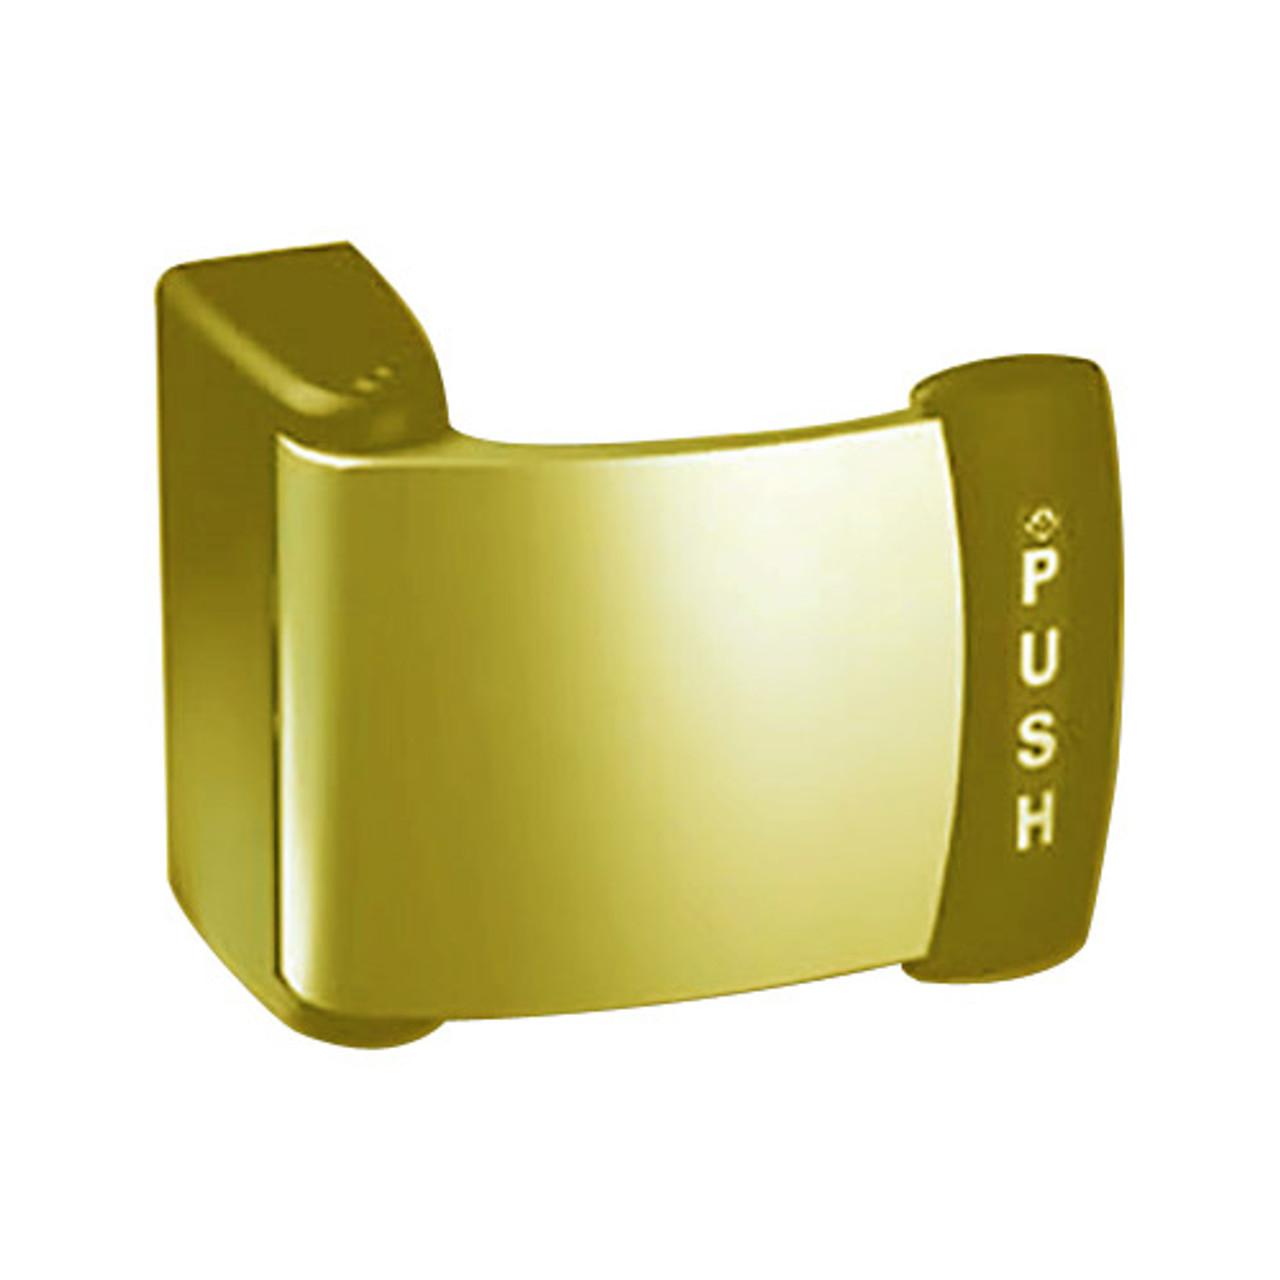 4591-03-04-US3 Adams Rite Deadlatch Paddle in Bright Brass Finish